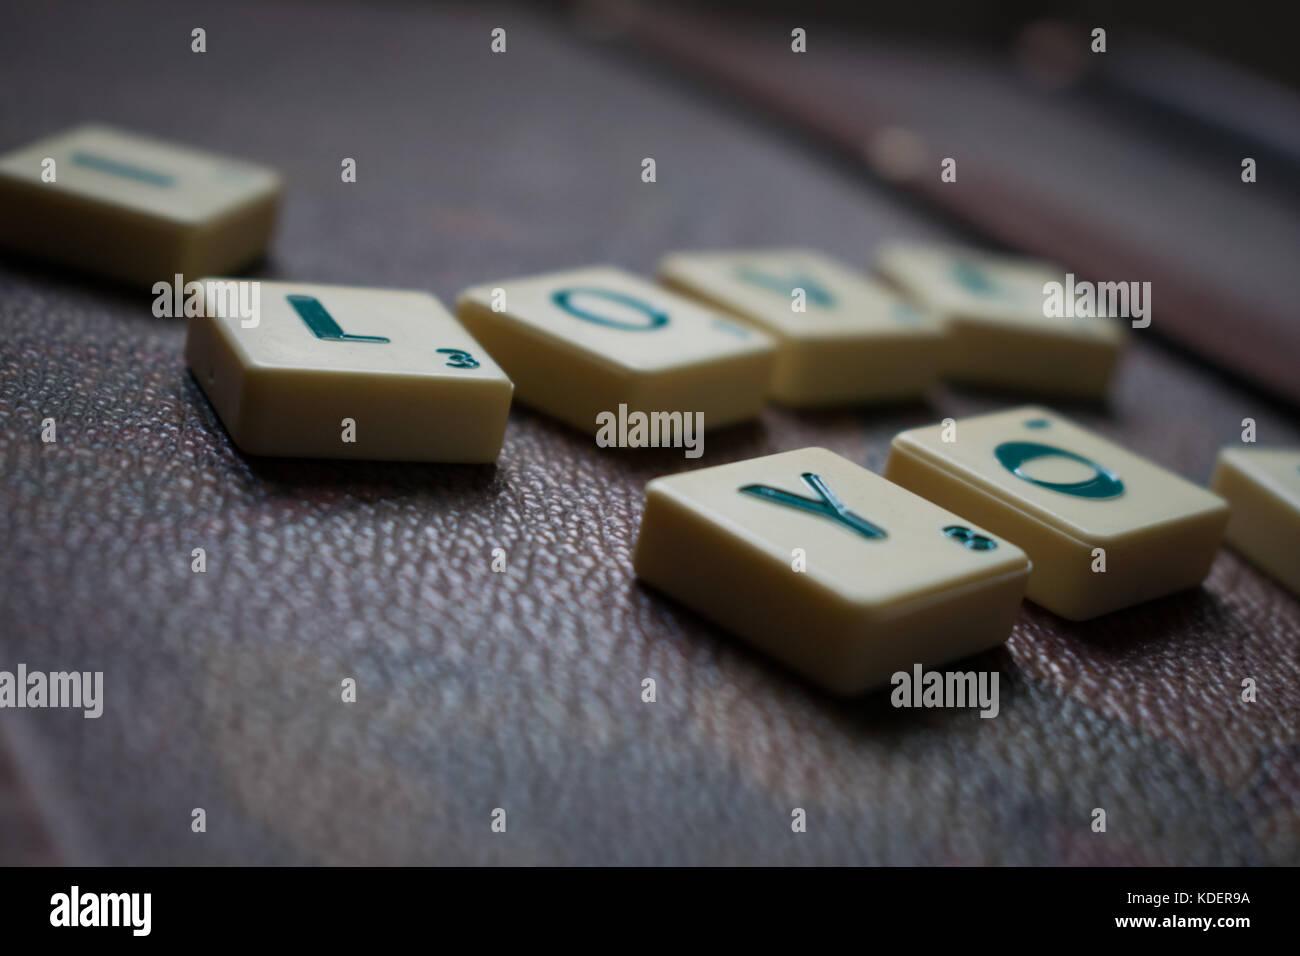 I Love You Romántico Palabras Scrabble Letras Mosaico Foto Imagen